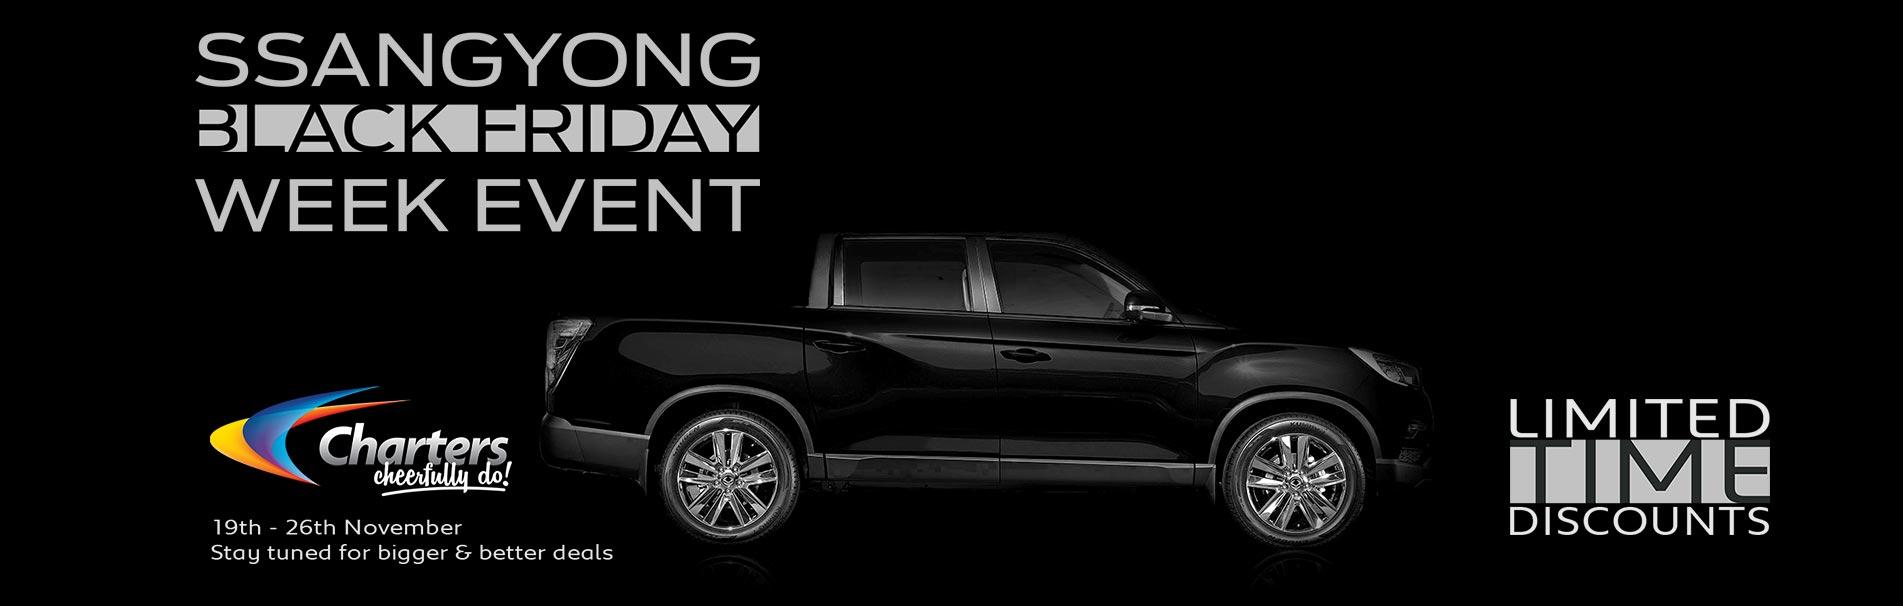 a-ssangyong-black-friday-car-sales-weekend-reading-sli